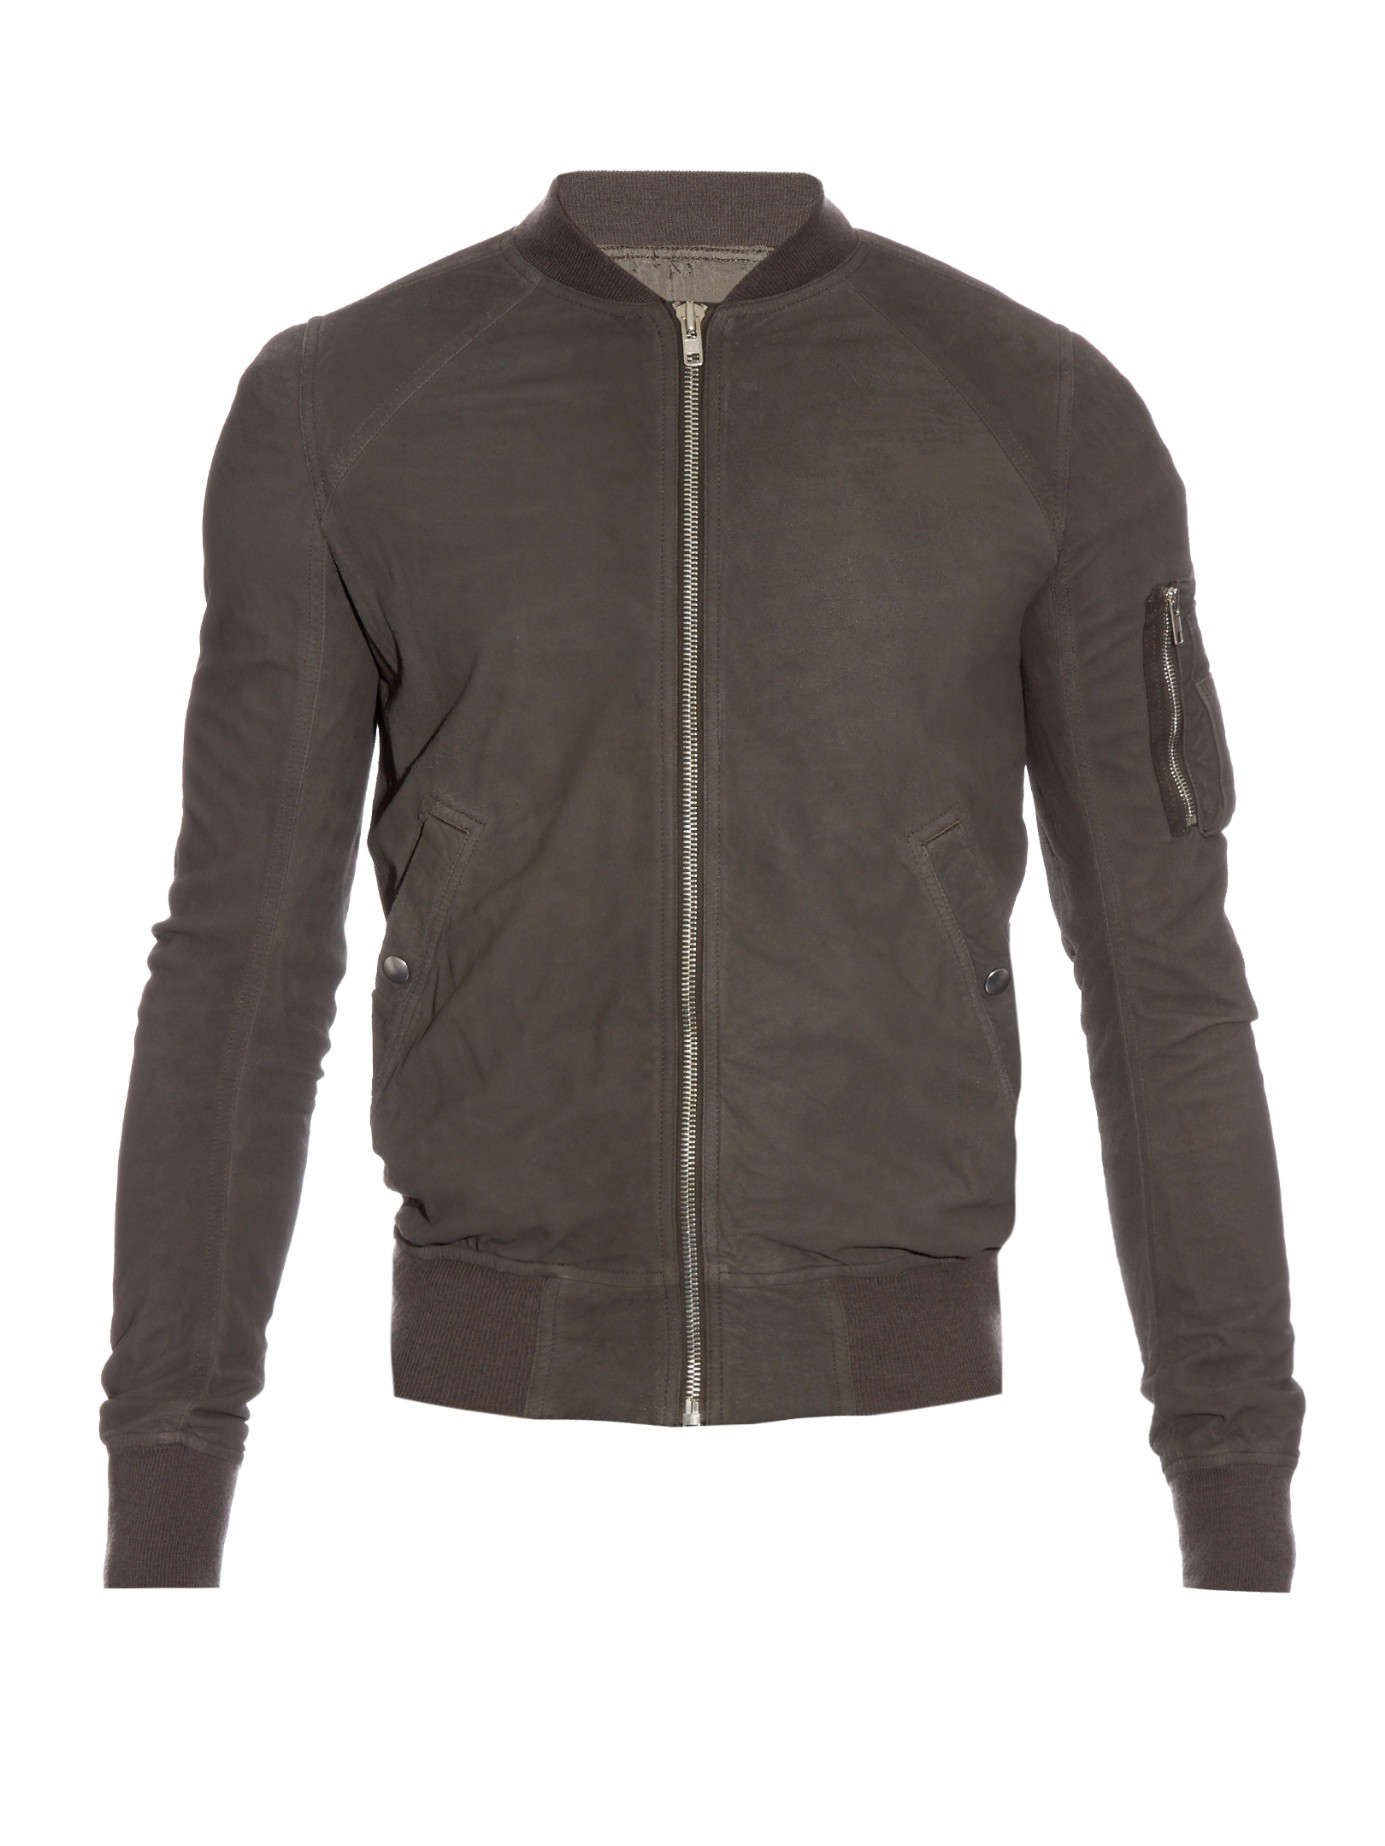 Leather Kimono Blouse Rick Owens Cheap Sale Inexpensive Online Cheap Quality Sale Nicekicks 2dga5